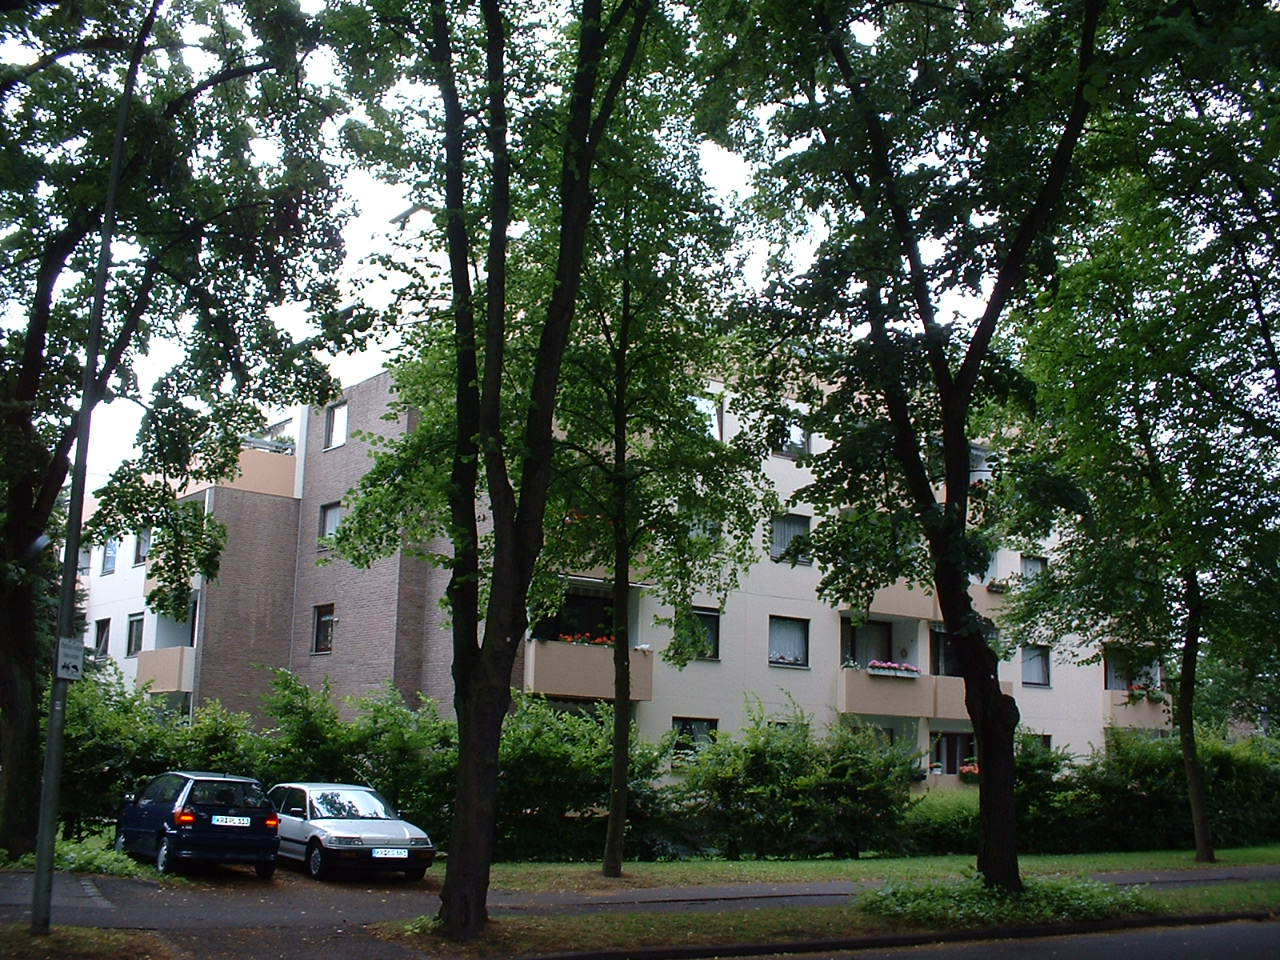 Hausverwaltung Krefeld - Canisiusstraße - WEG-Verwalter